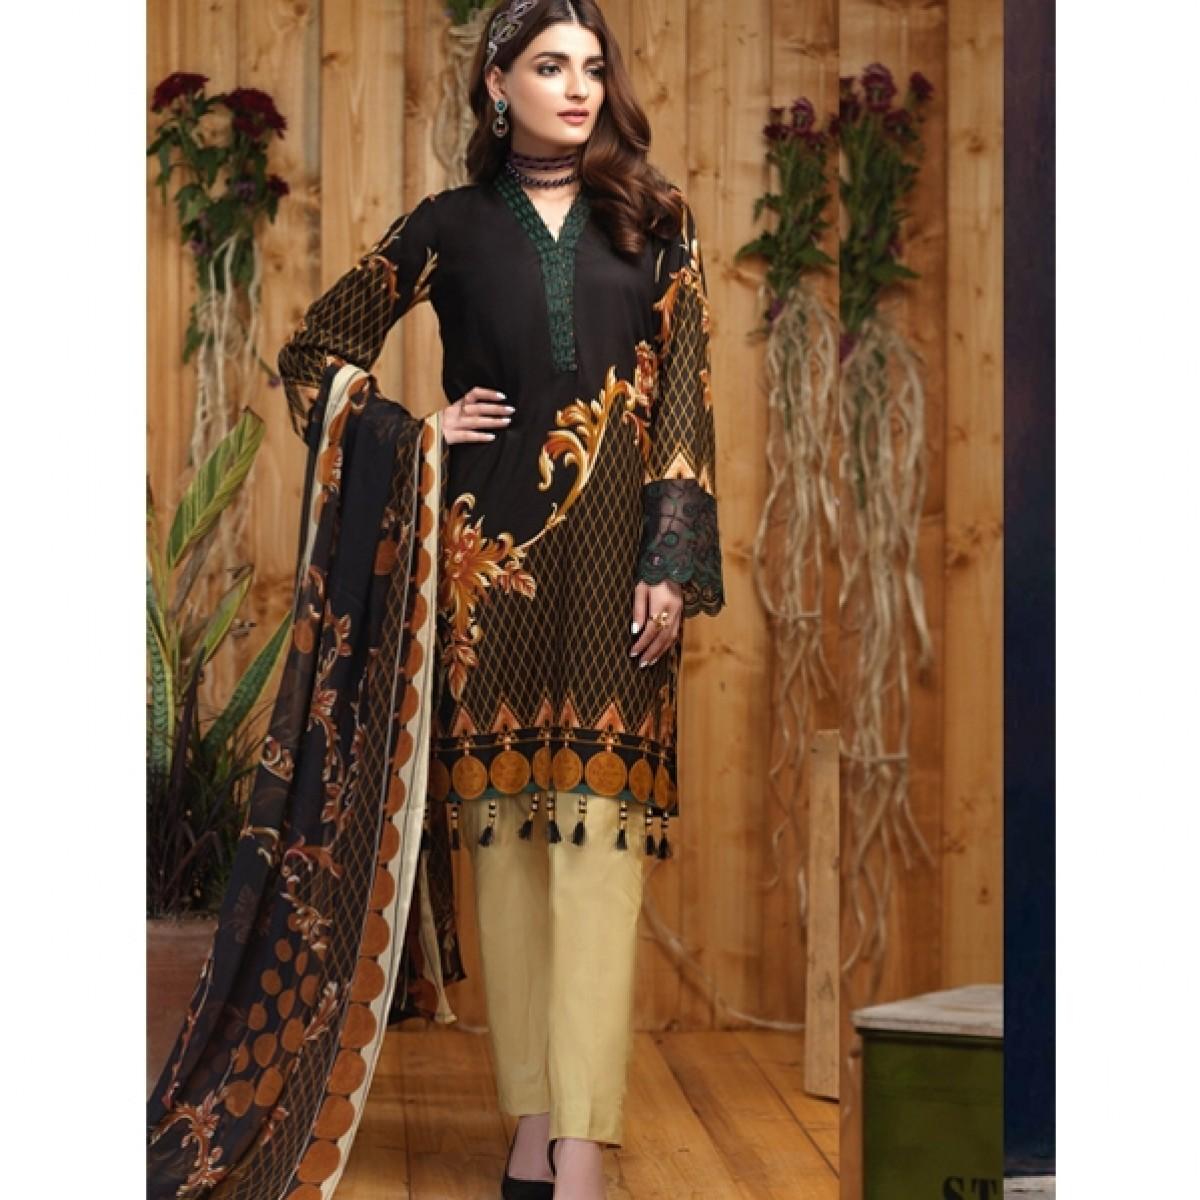 f2ca817fbc Salitex Silkoria Emb Collection Vol 4 2019 (RC-162A) Price in Pakistan |  Buy Salitex Silkoria Lawn Collection 3 Piece | iShopping.pk